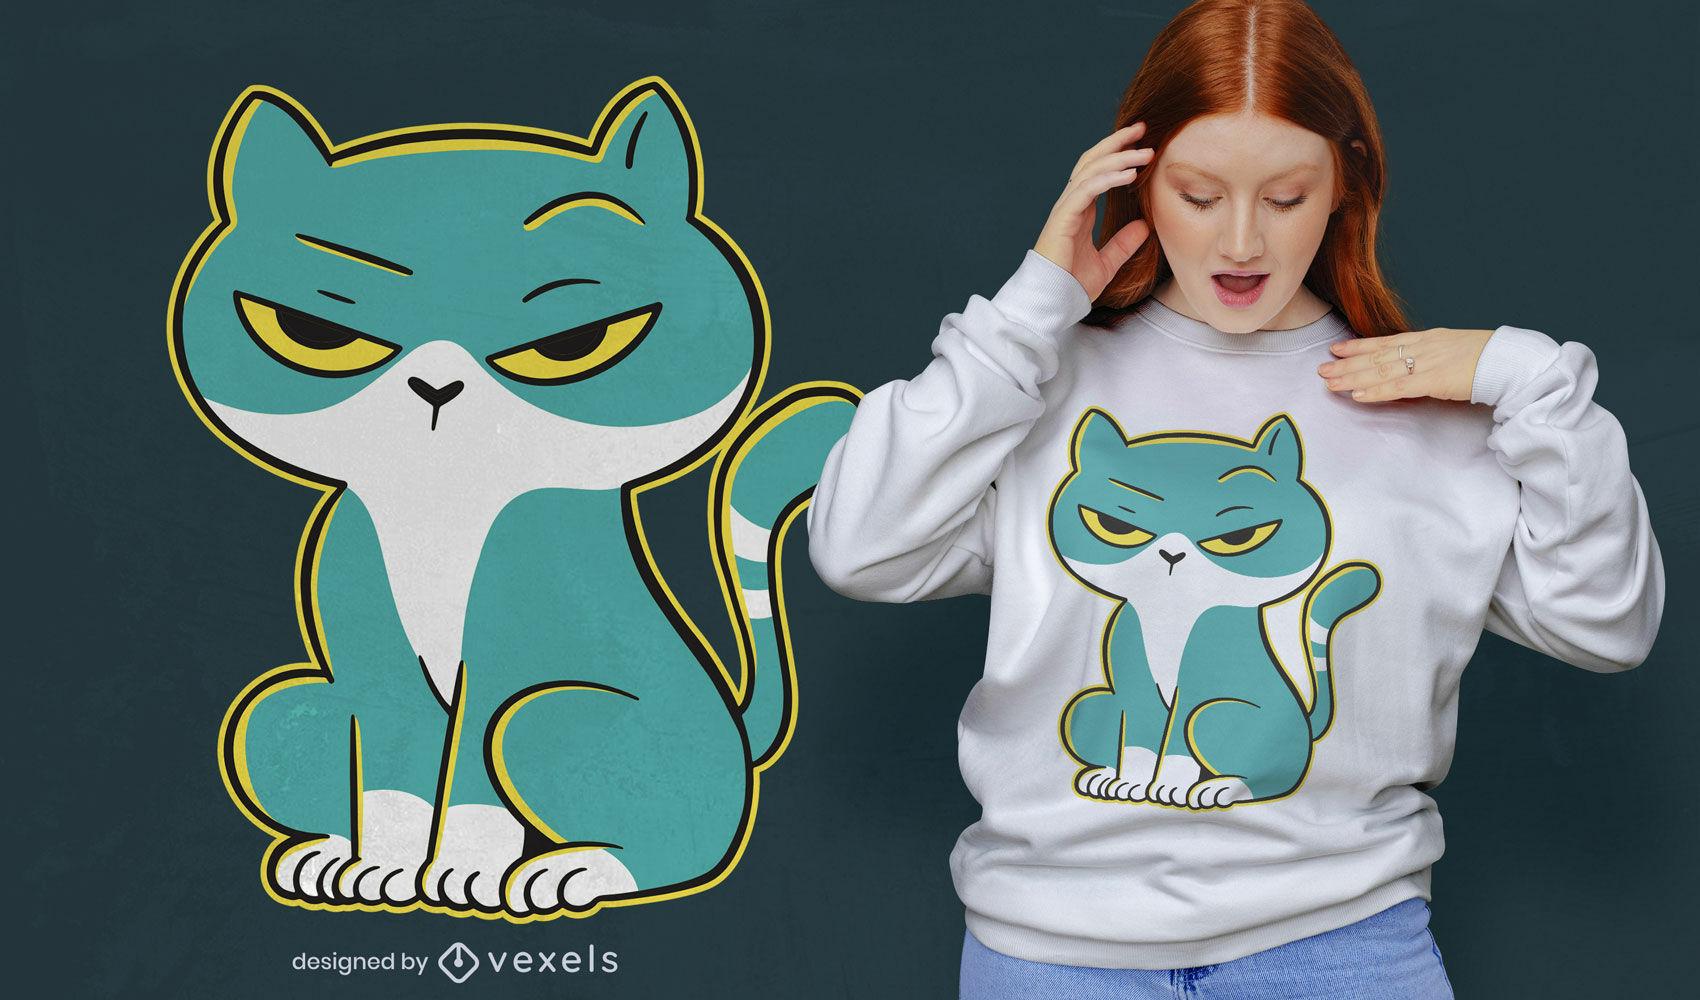 Diseño de camiseta de dibujos animados de gato serio